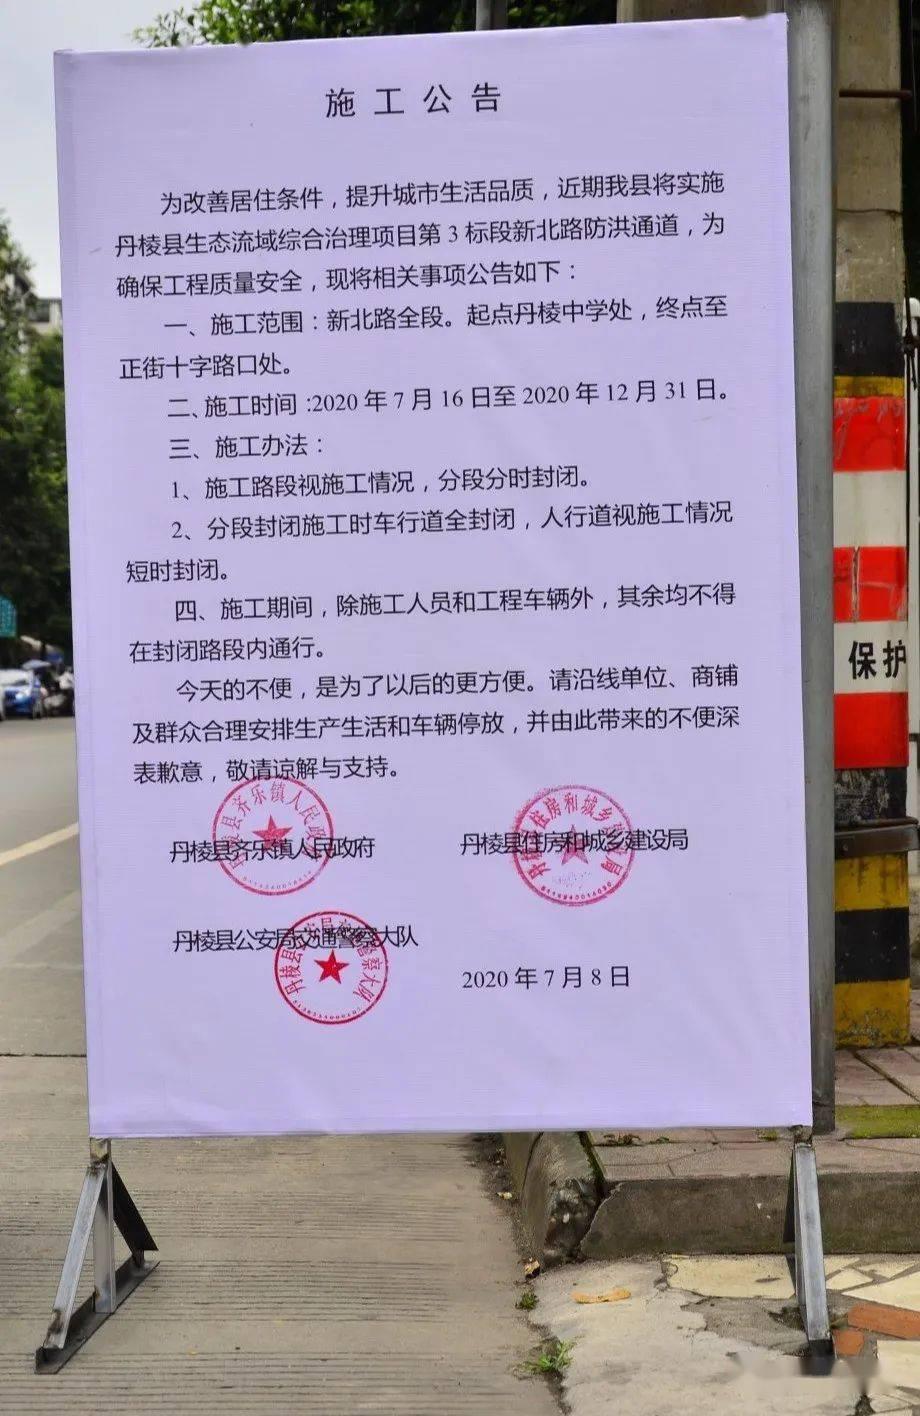 <b>@丹岭小伙伴!丹棱城区路即将被切断施工,所以</b>